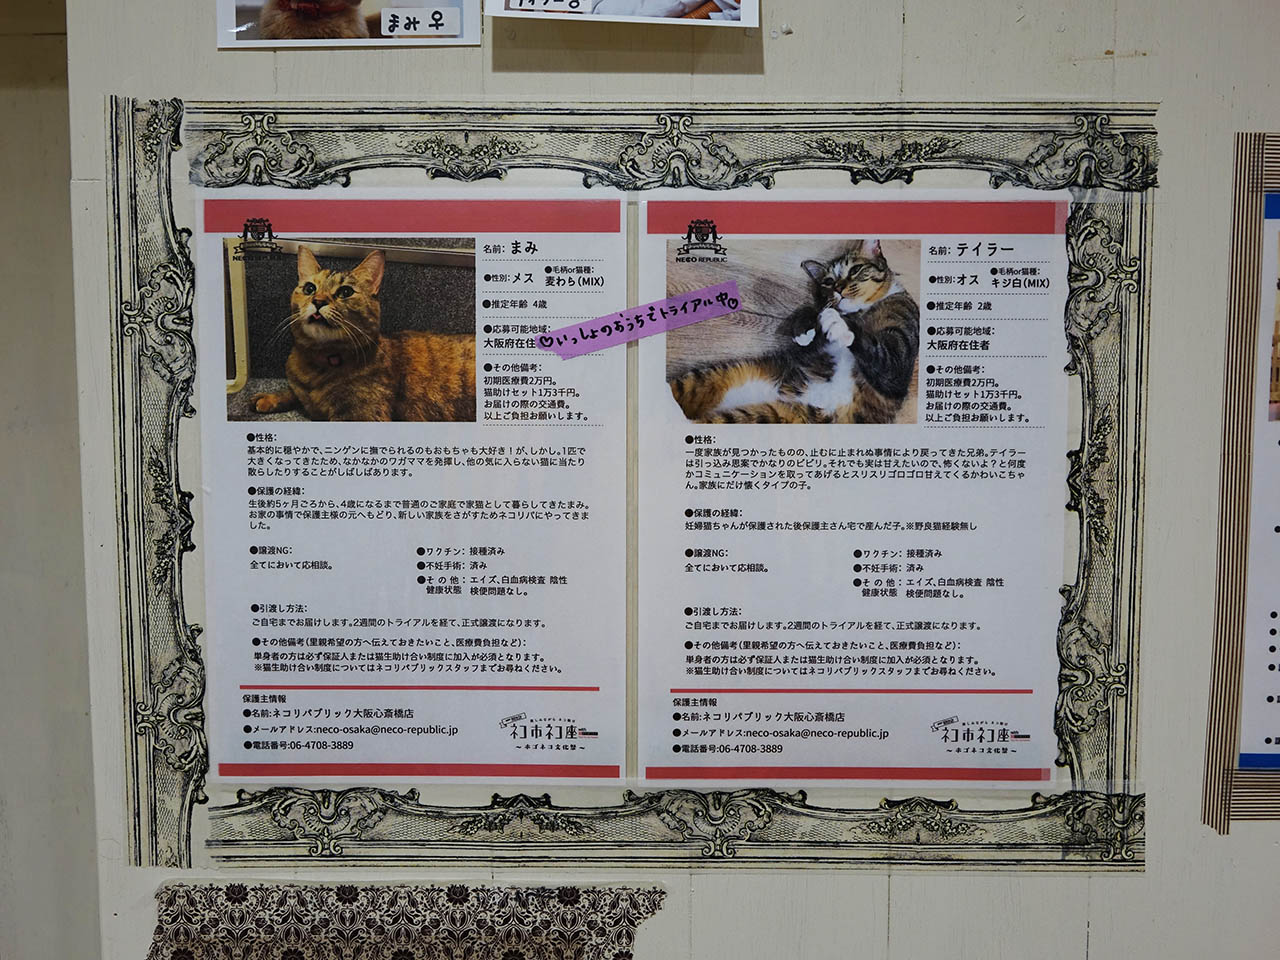 Cats of Neco Republic, #0546